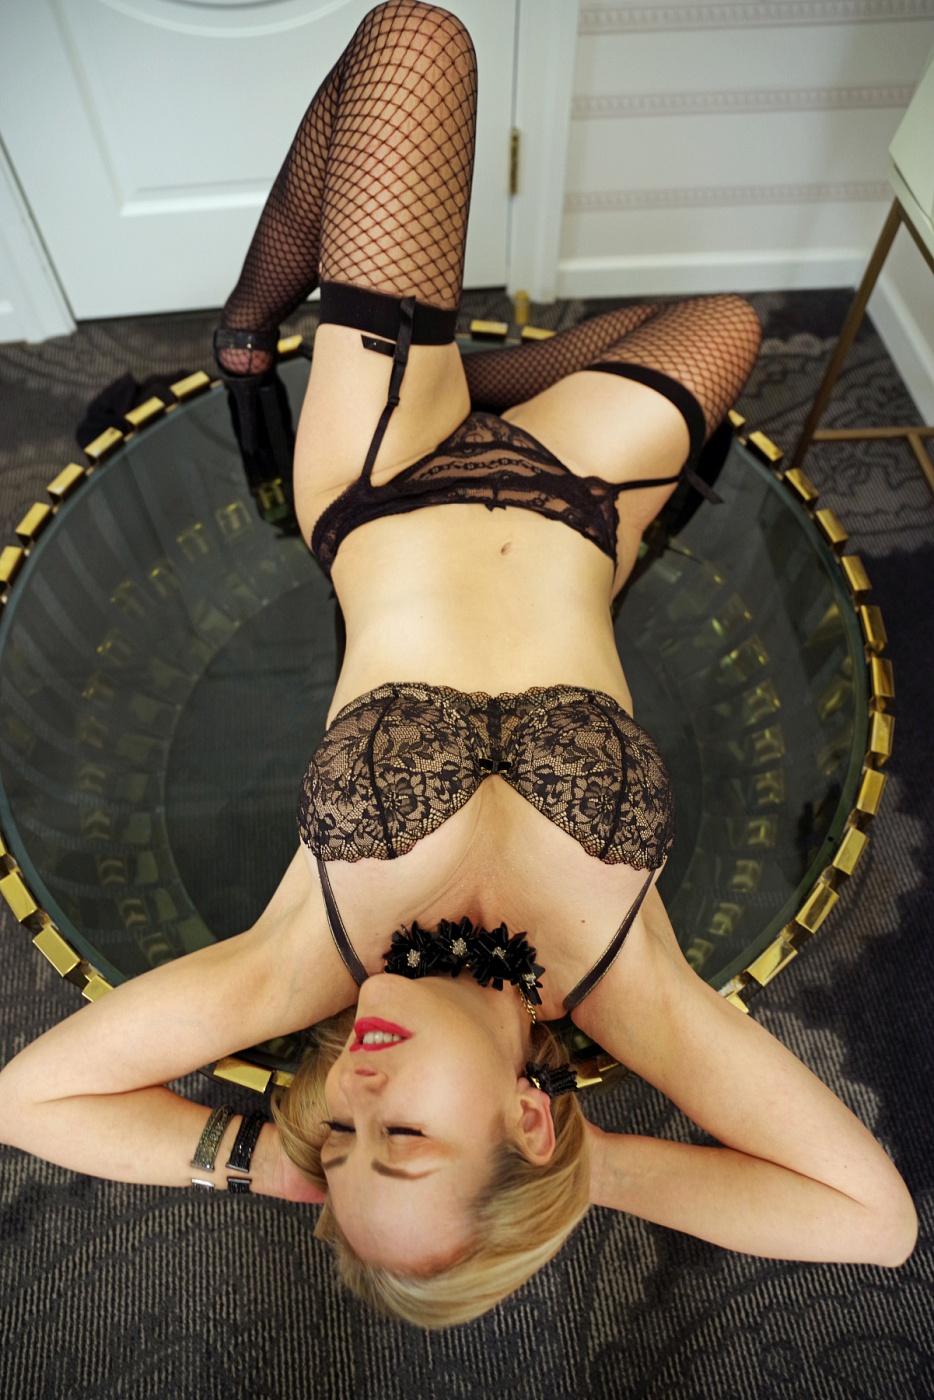 Amber Austin